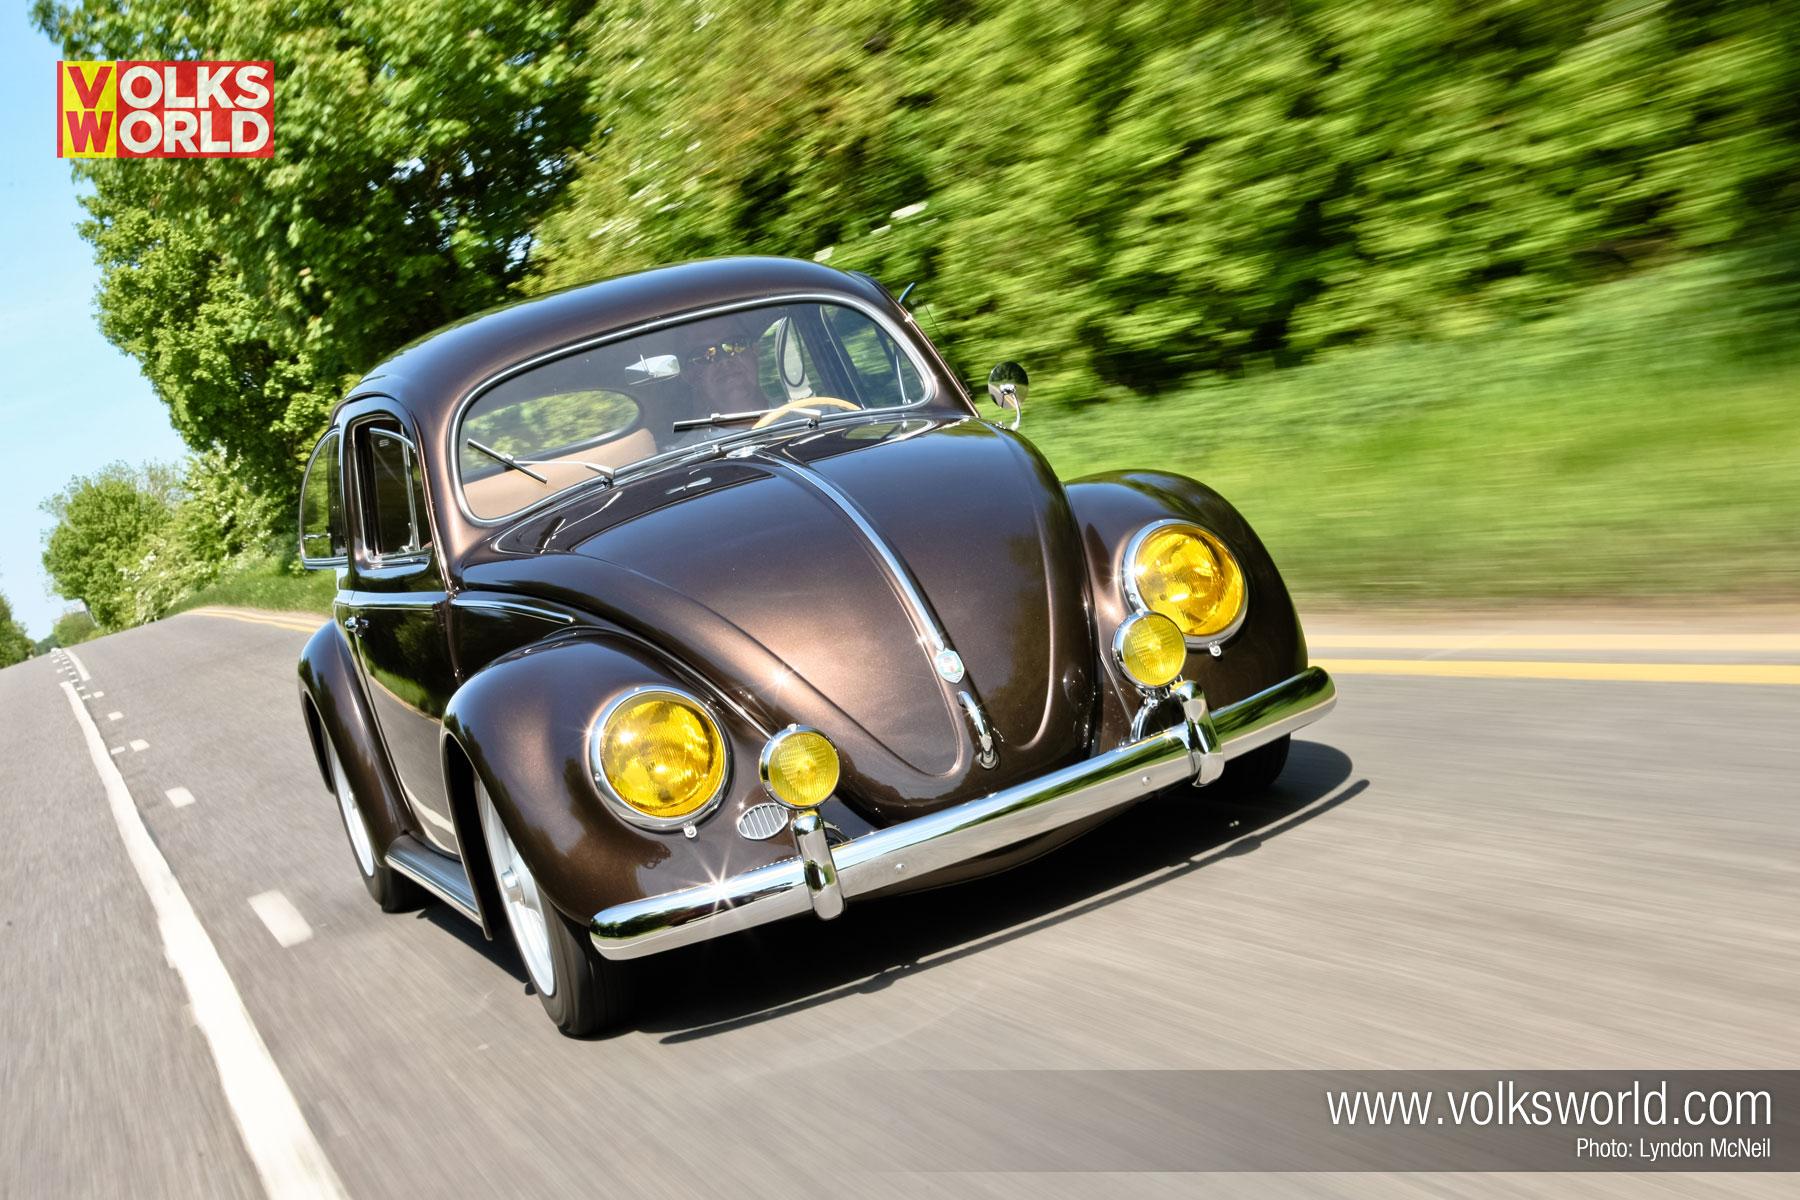 VW Wallpaper Sept 13 10 1800x1200